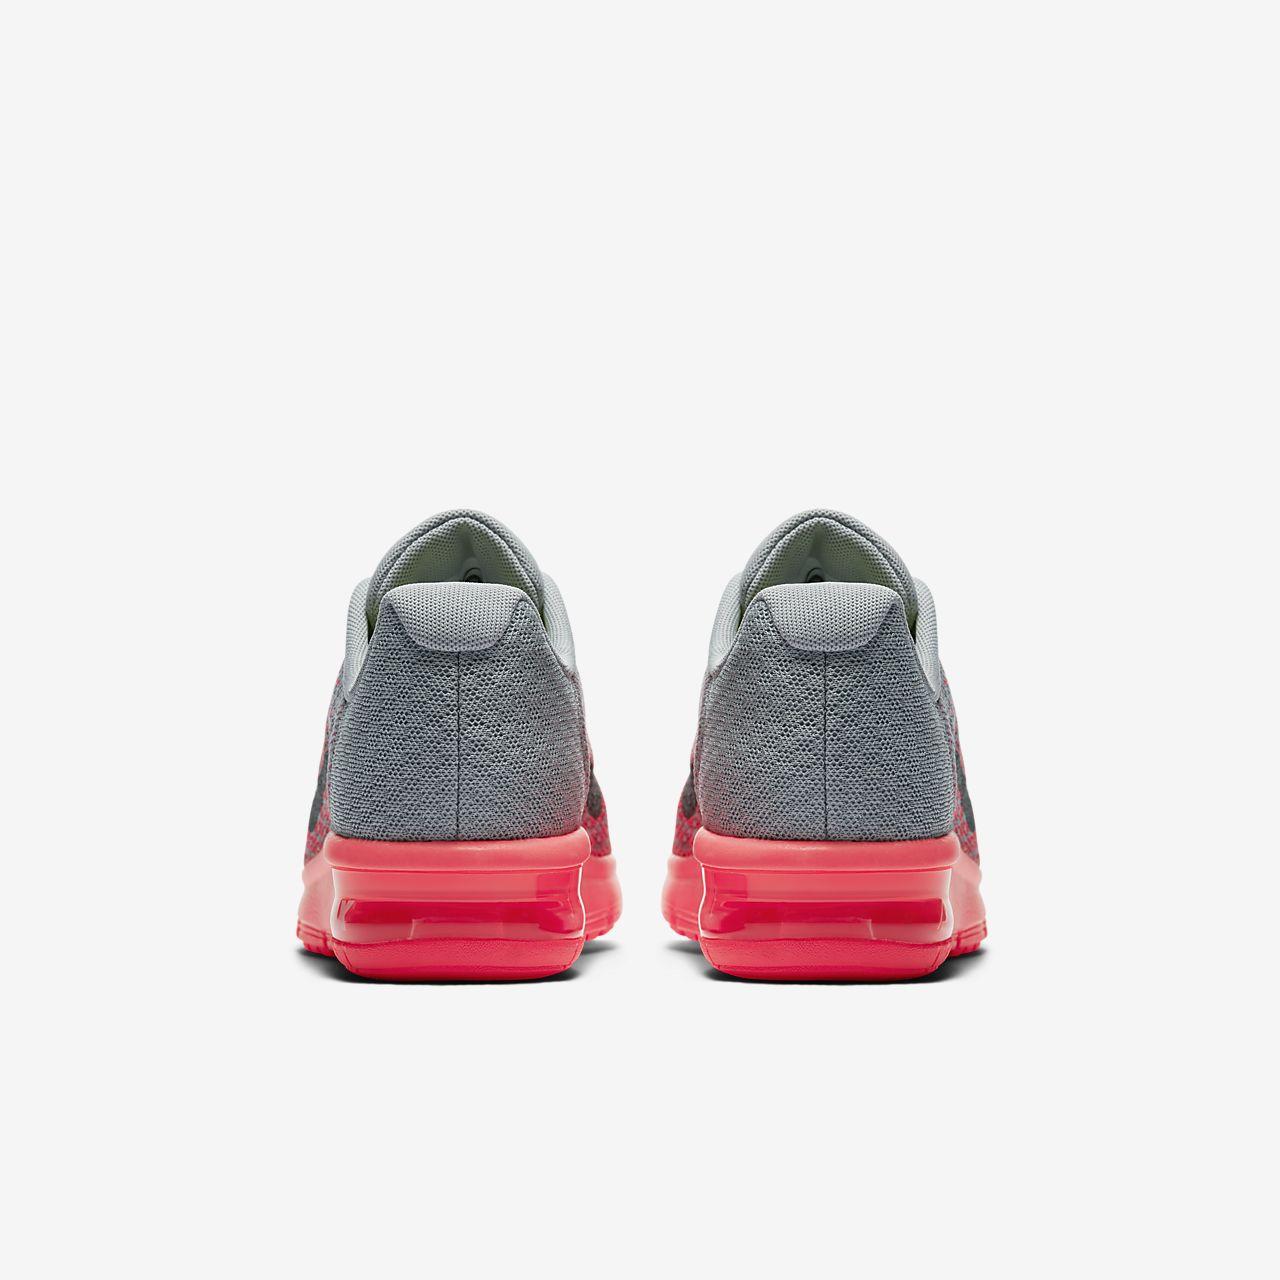 hot sale online 50ec7 ec198 ... Nike Air Max Sequent 2 Older Kids  Running Shoe